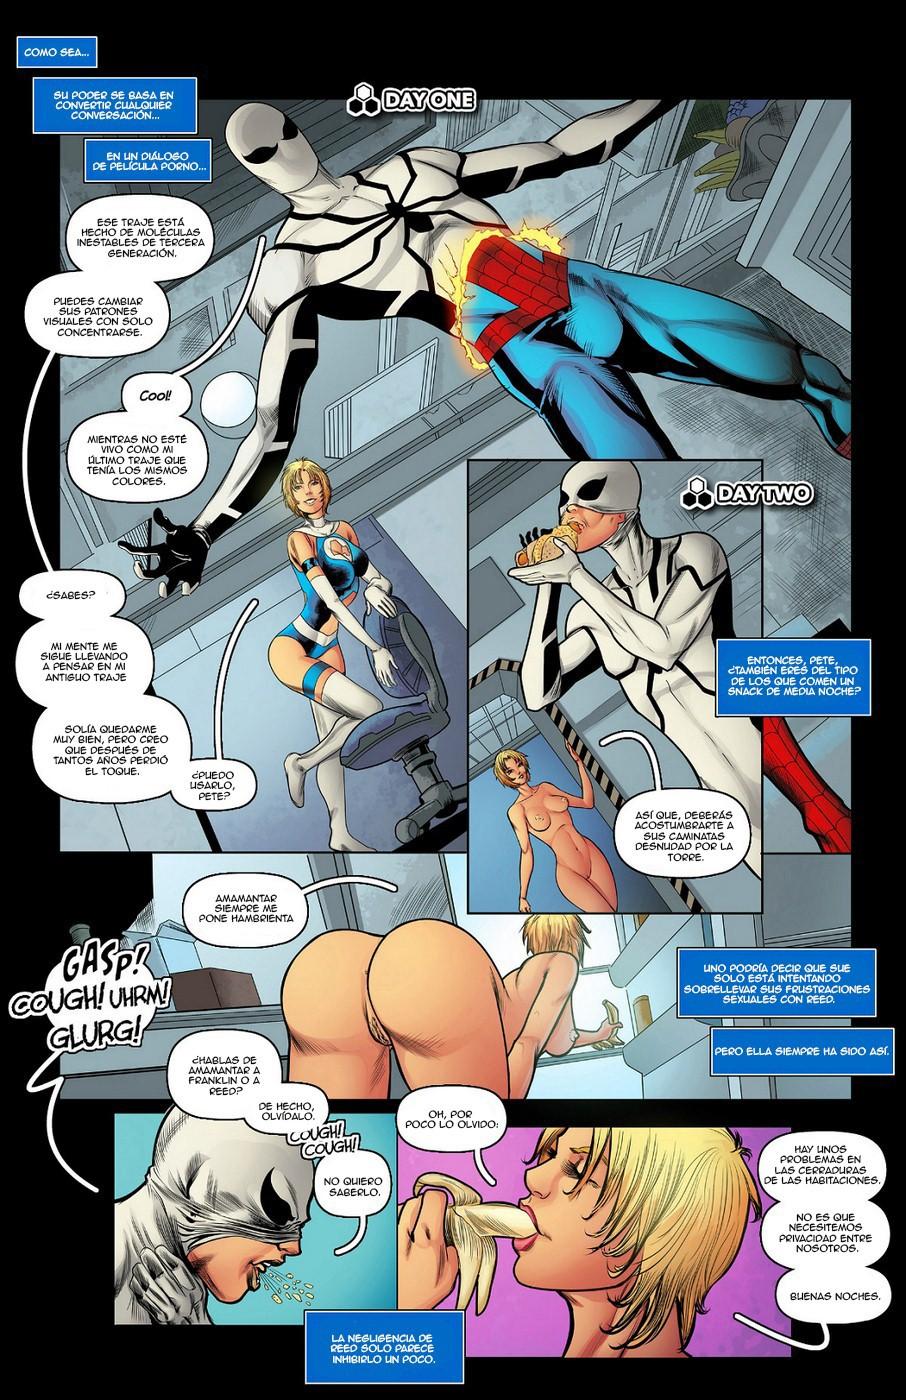 Amamantando A Un Hombre Porno xxx marvel porno sexo superheroes future foundation